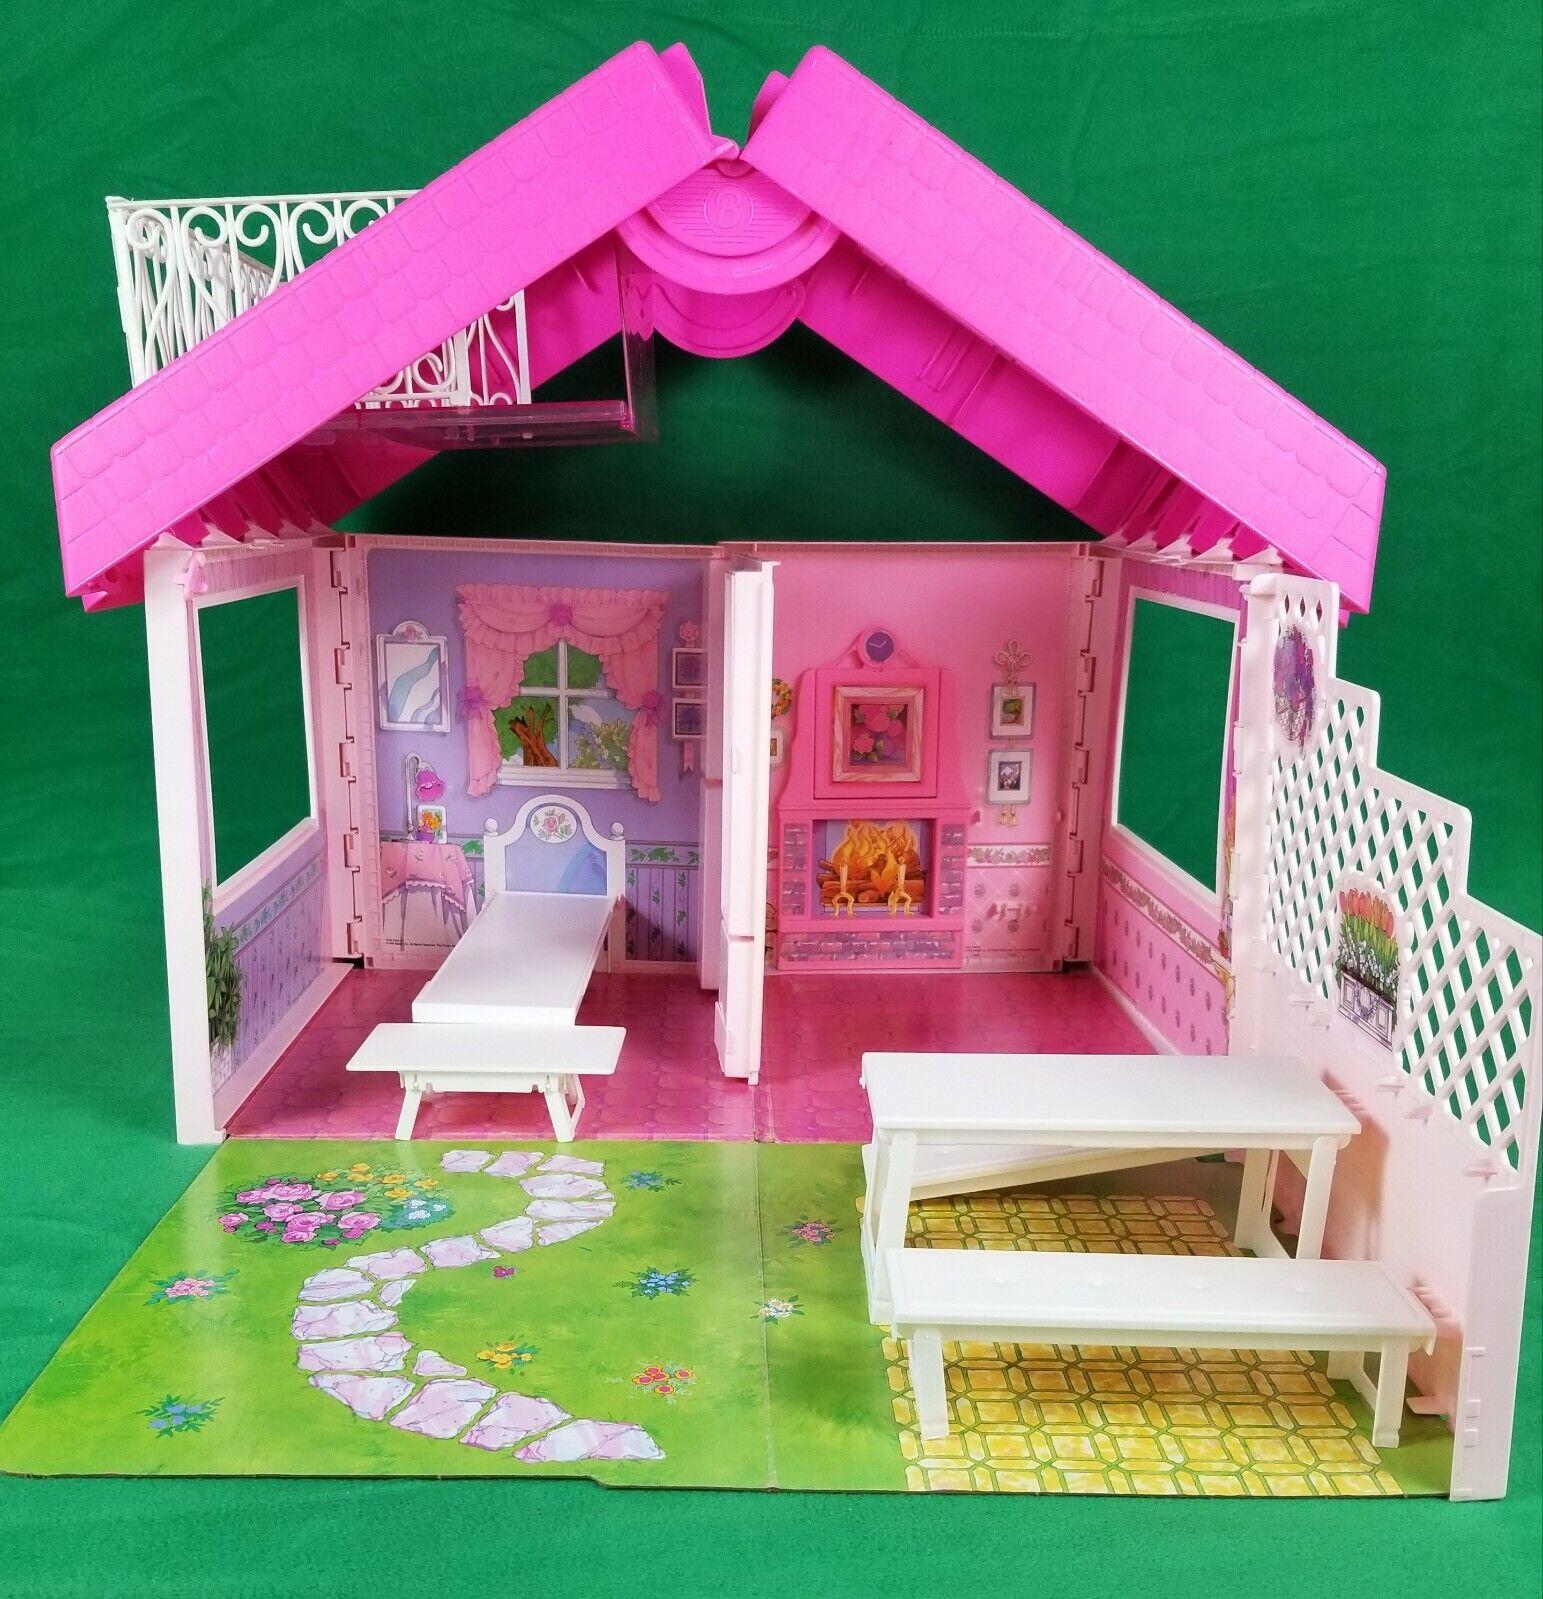 Jahr Barbie Fold 'N Fun hausTurns into a carrying Fall Mattel